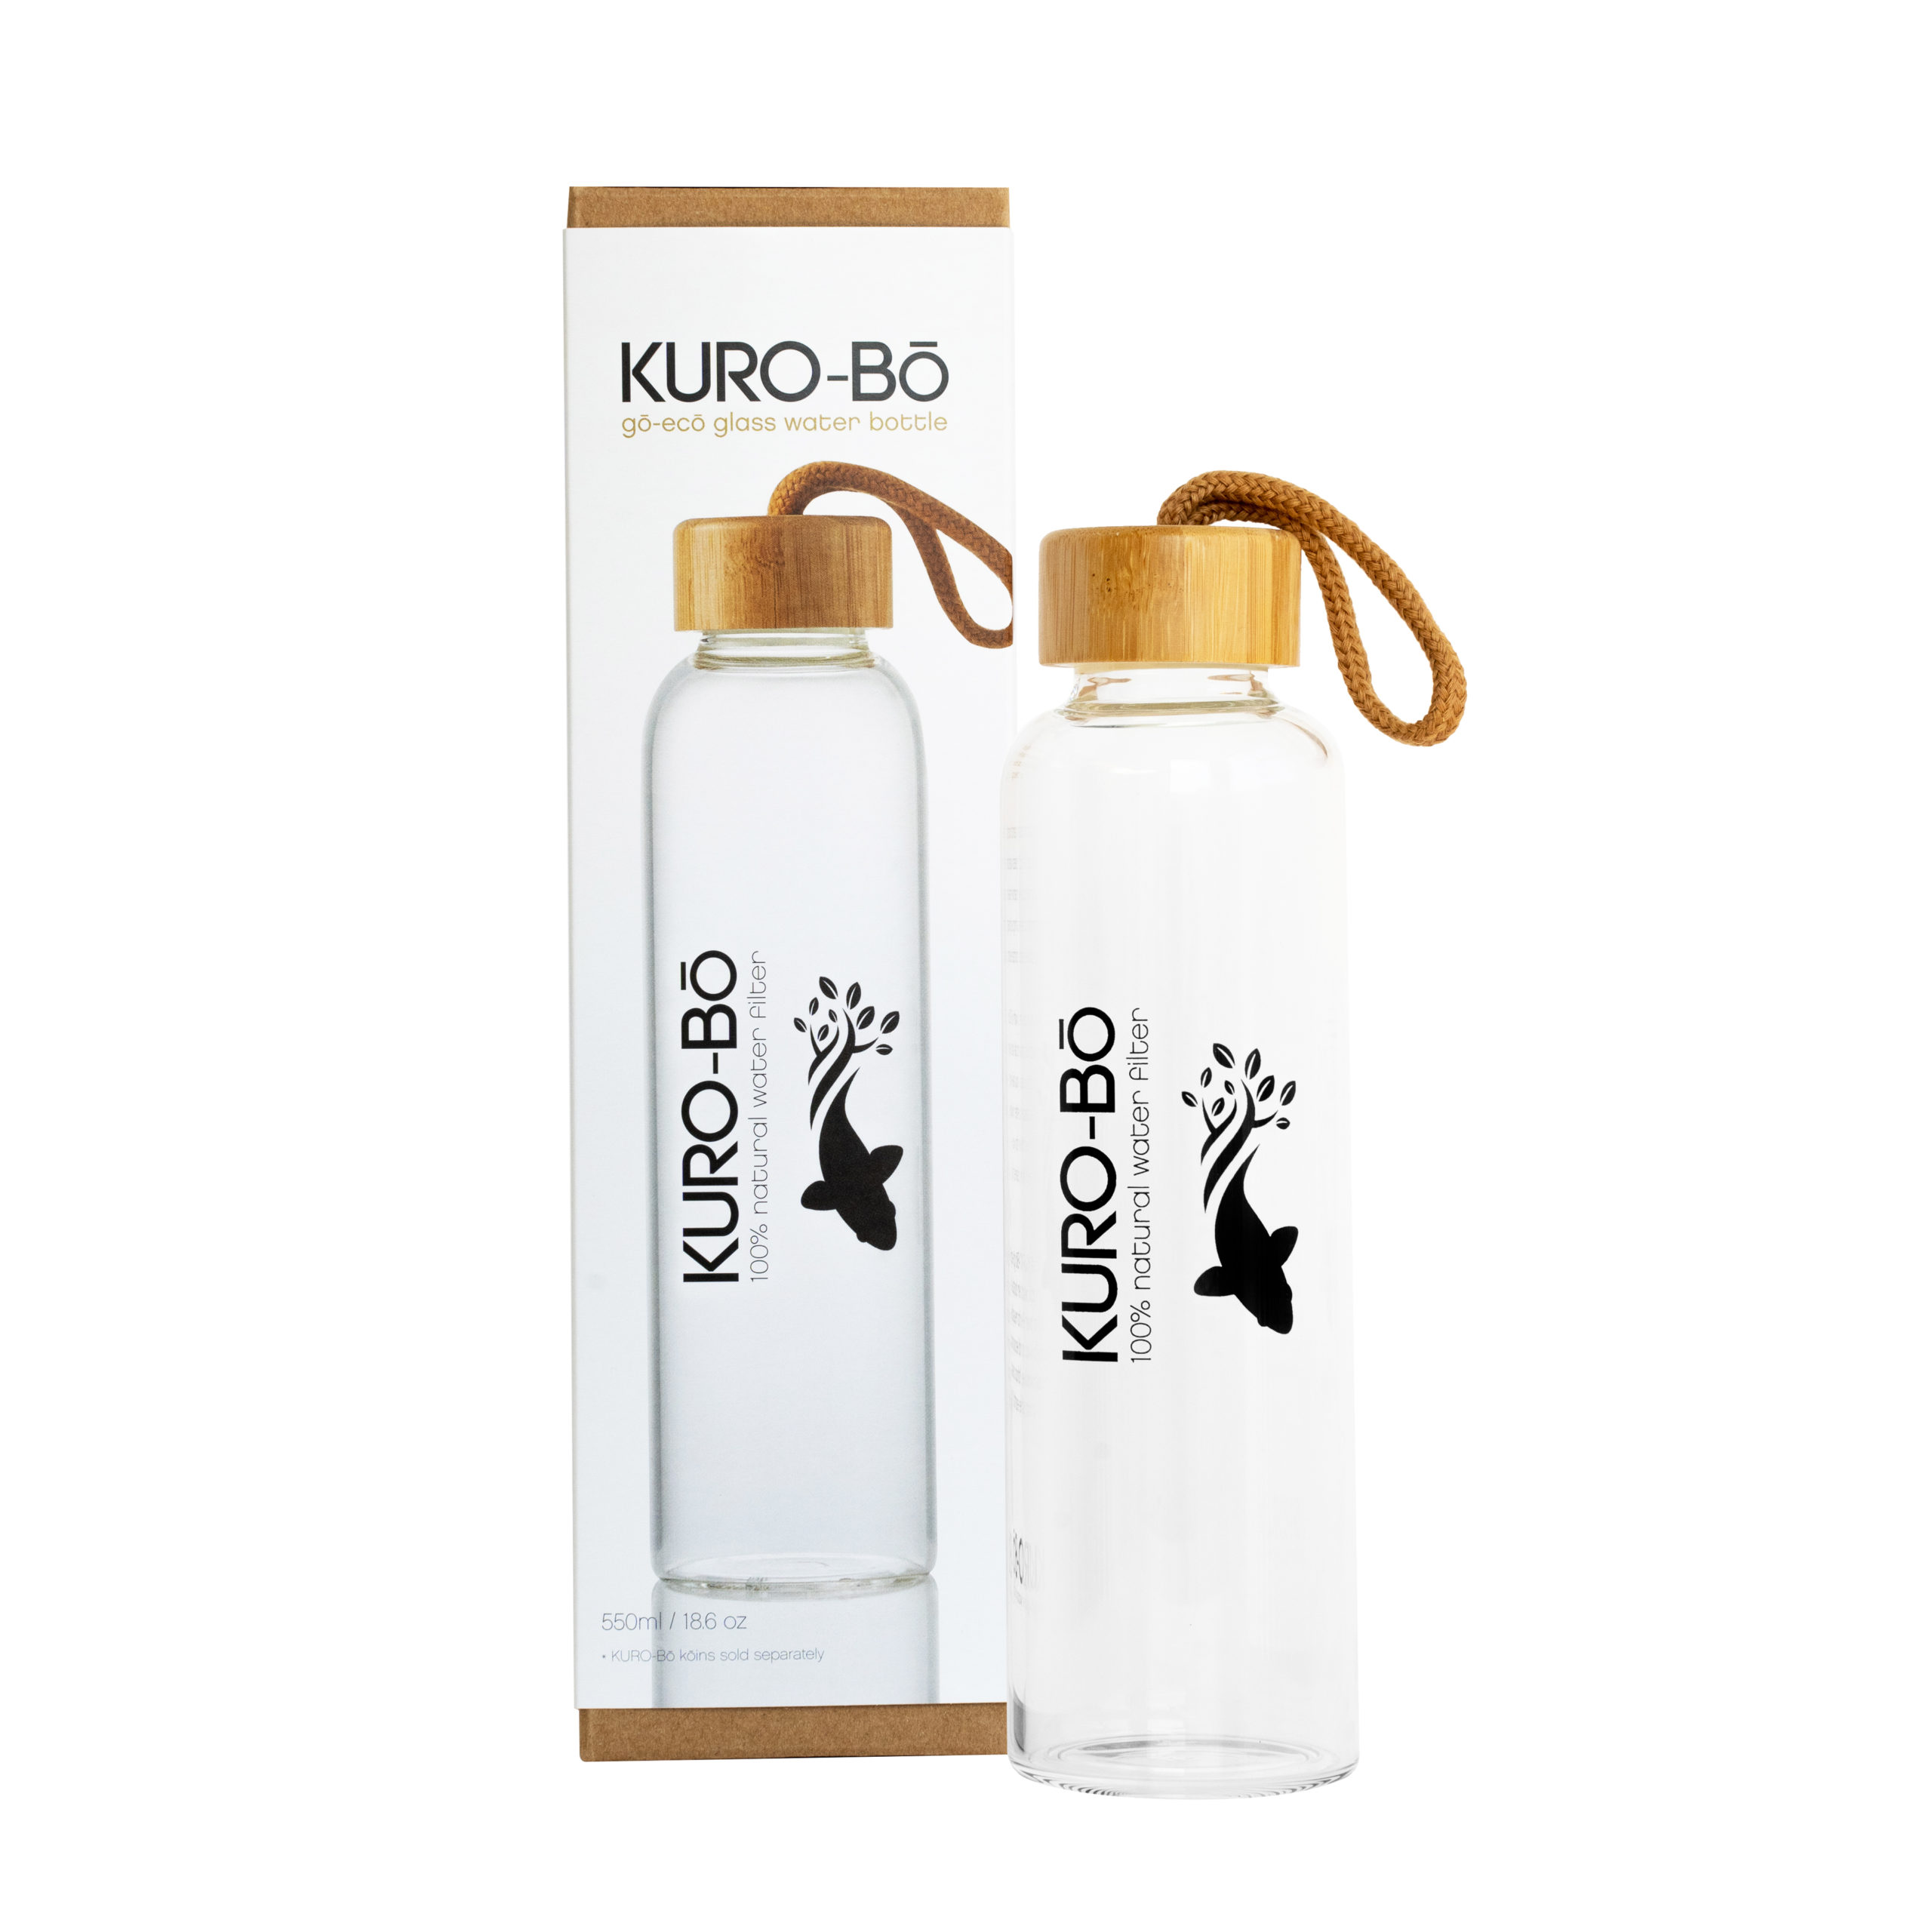 kuro bo go eco glass water bottle 550 ml kuro bō kuro bō gō ecō glass water bottle 550ml